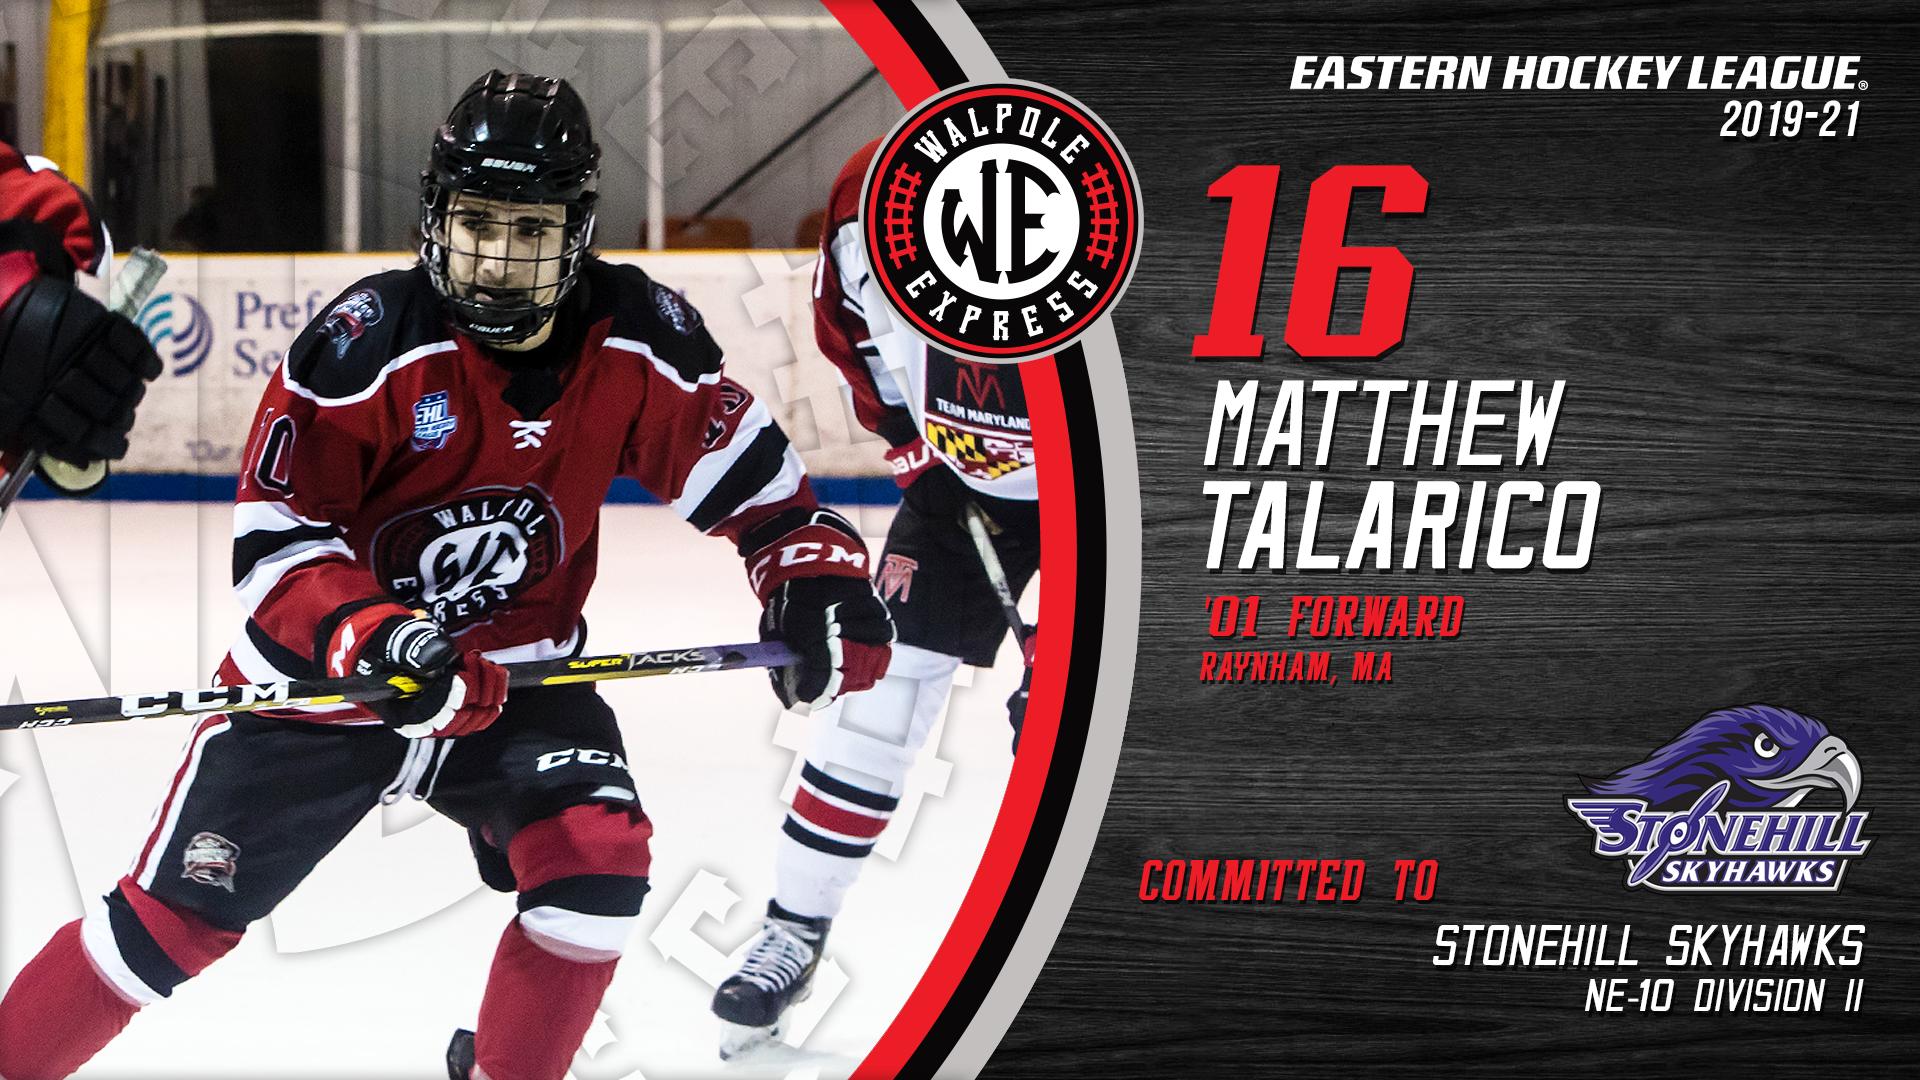 Matthew Talarico